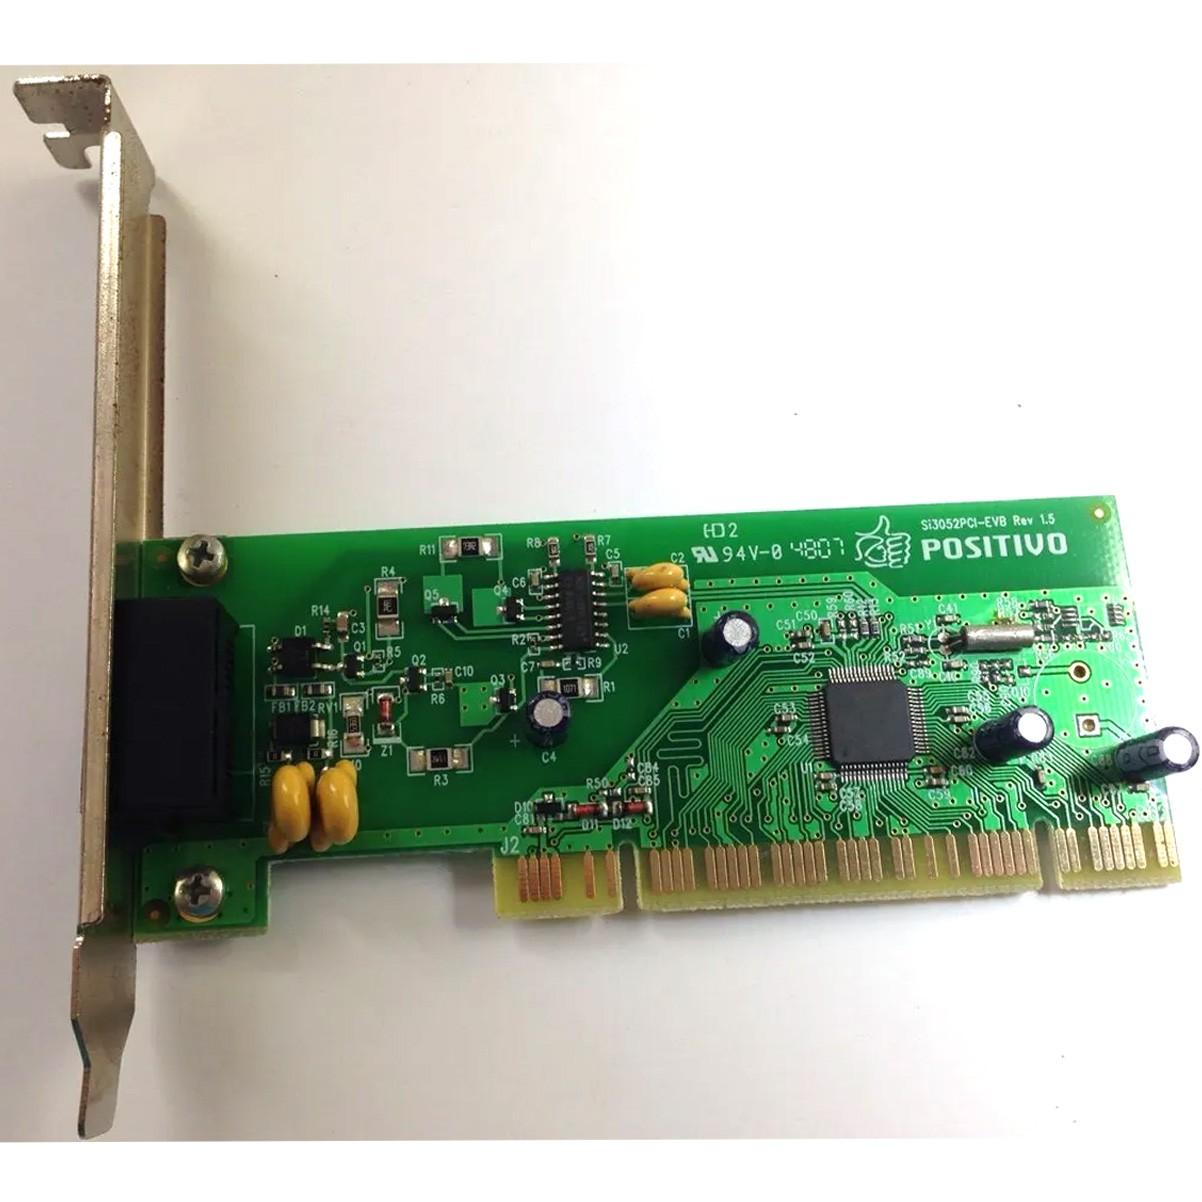 Placa Fax Modem Positivo/motorola PN: Si3052pci-evb Rev 1.5 - Retirado